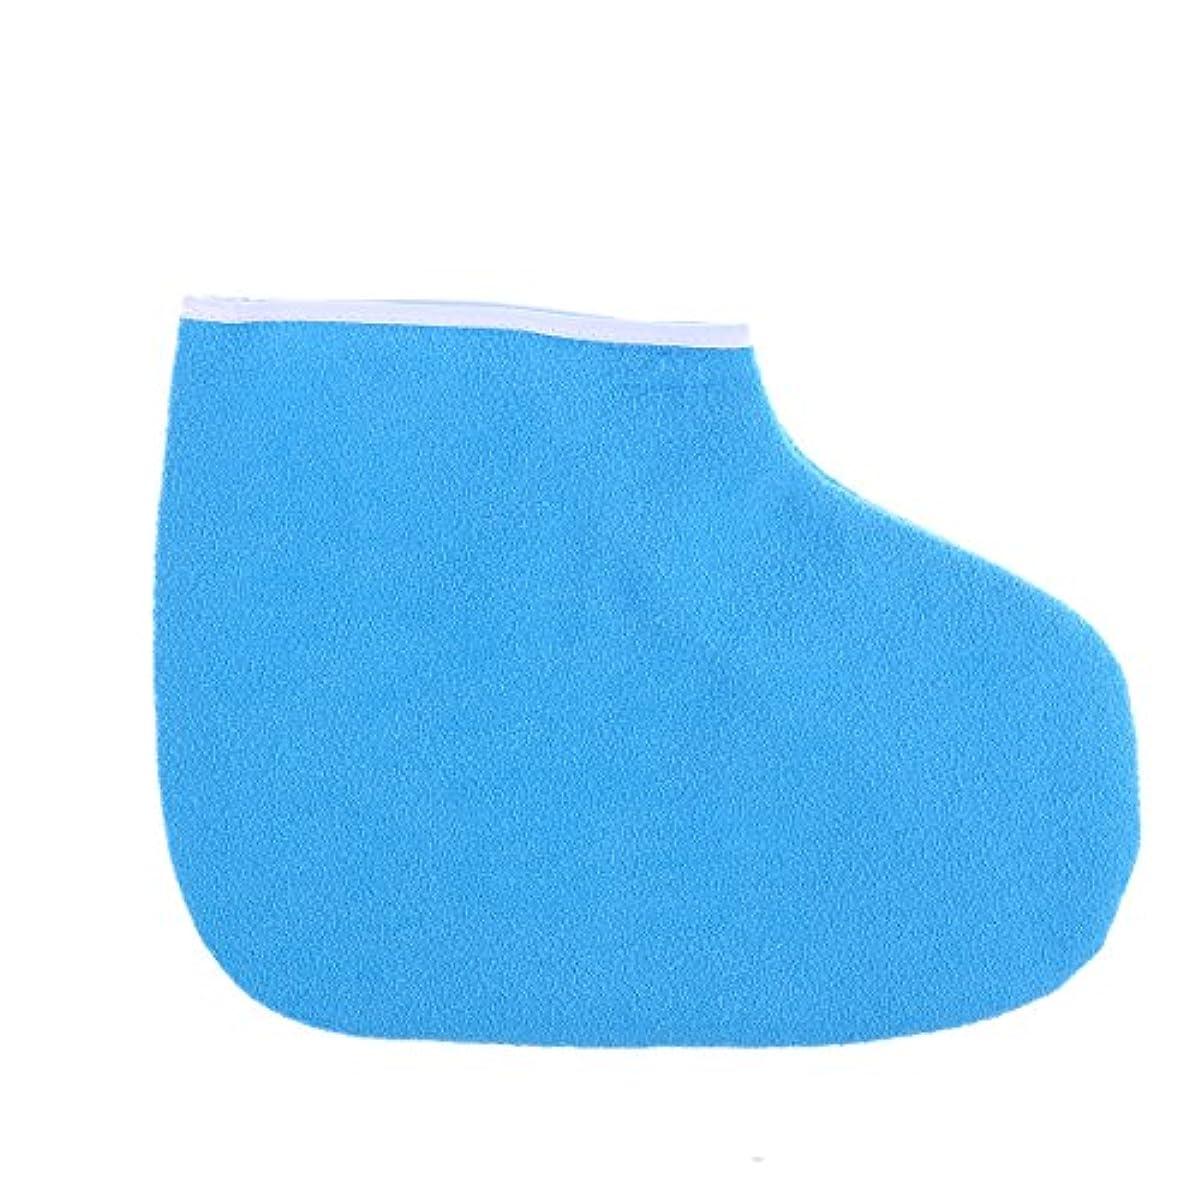 Healifty パラフィンワックスブーティーマニキュアペディキュアトリートメントブーツ(ブルー)